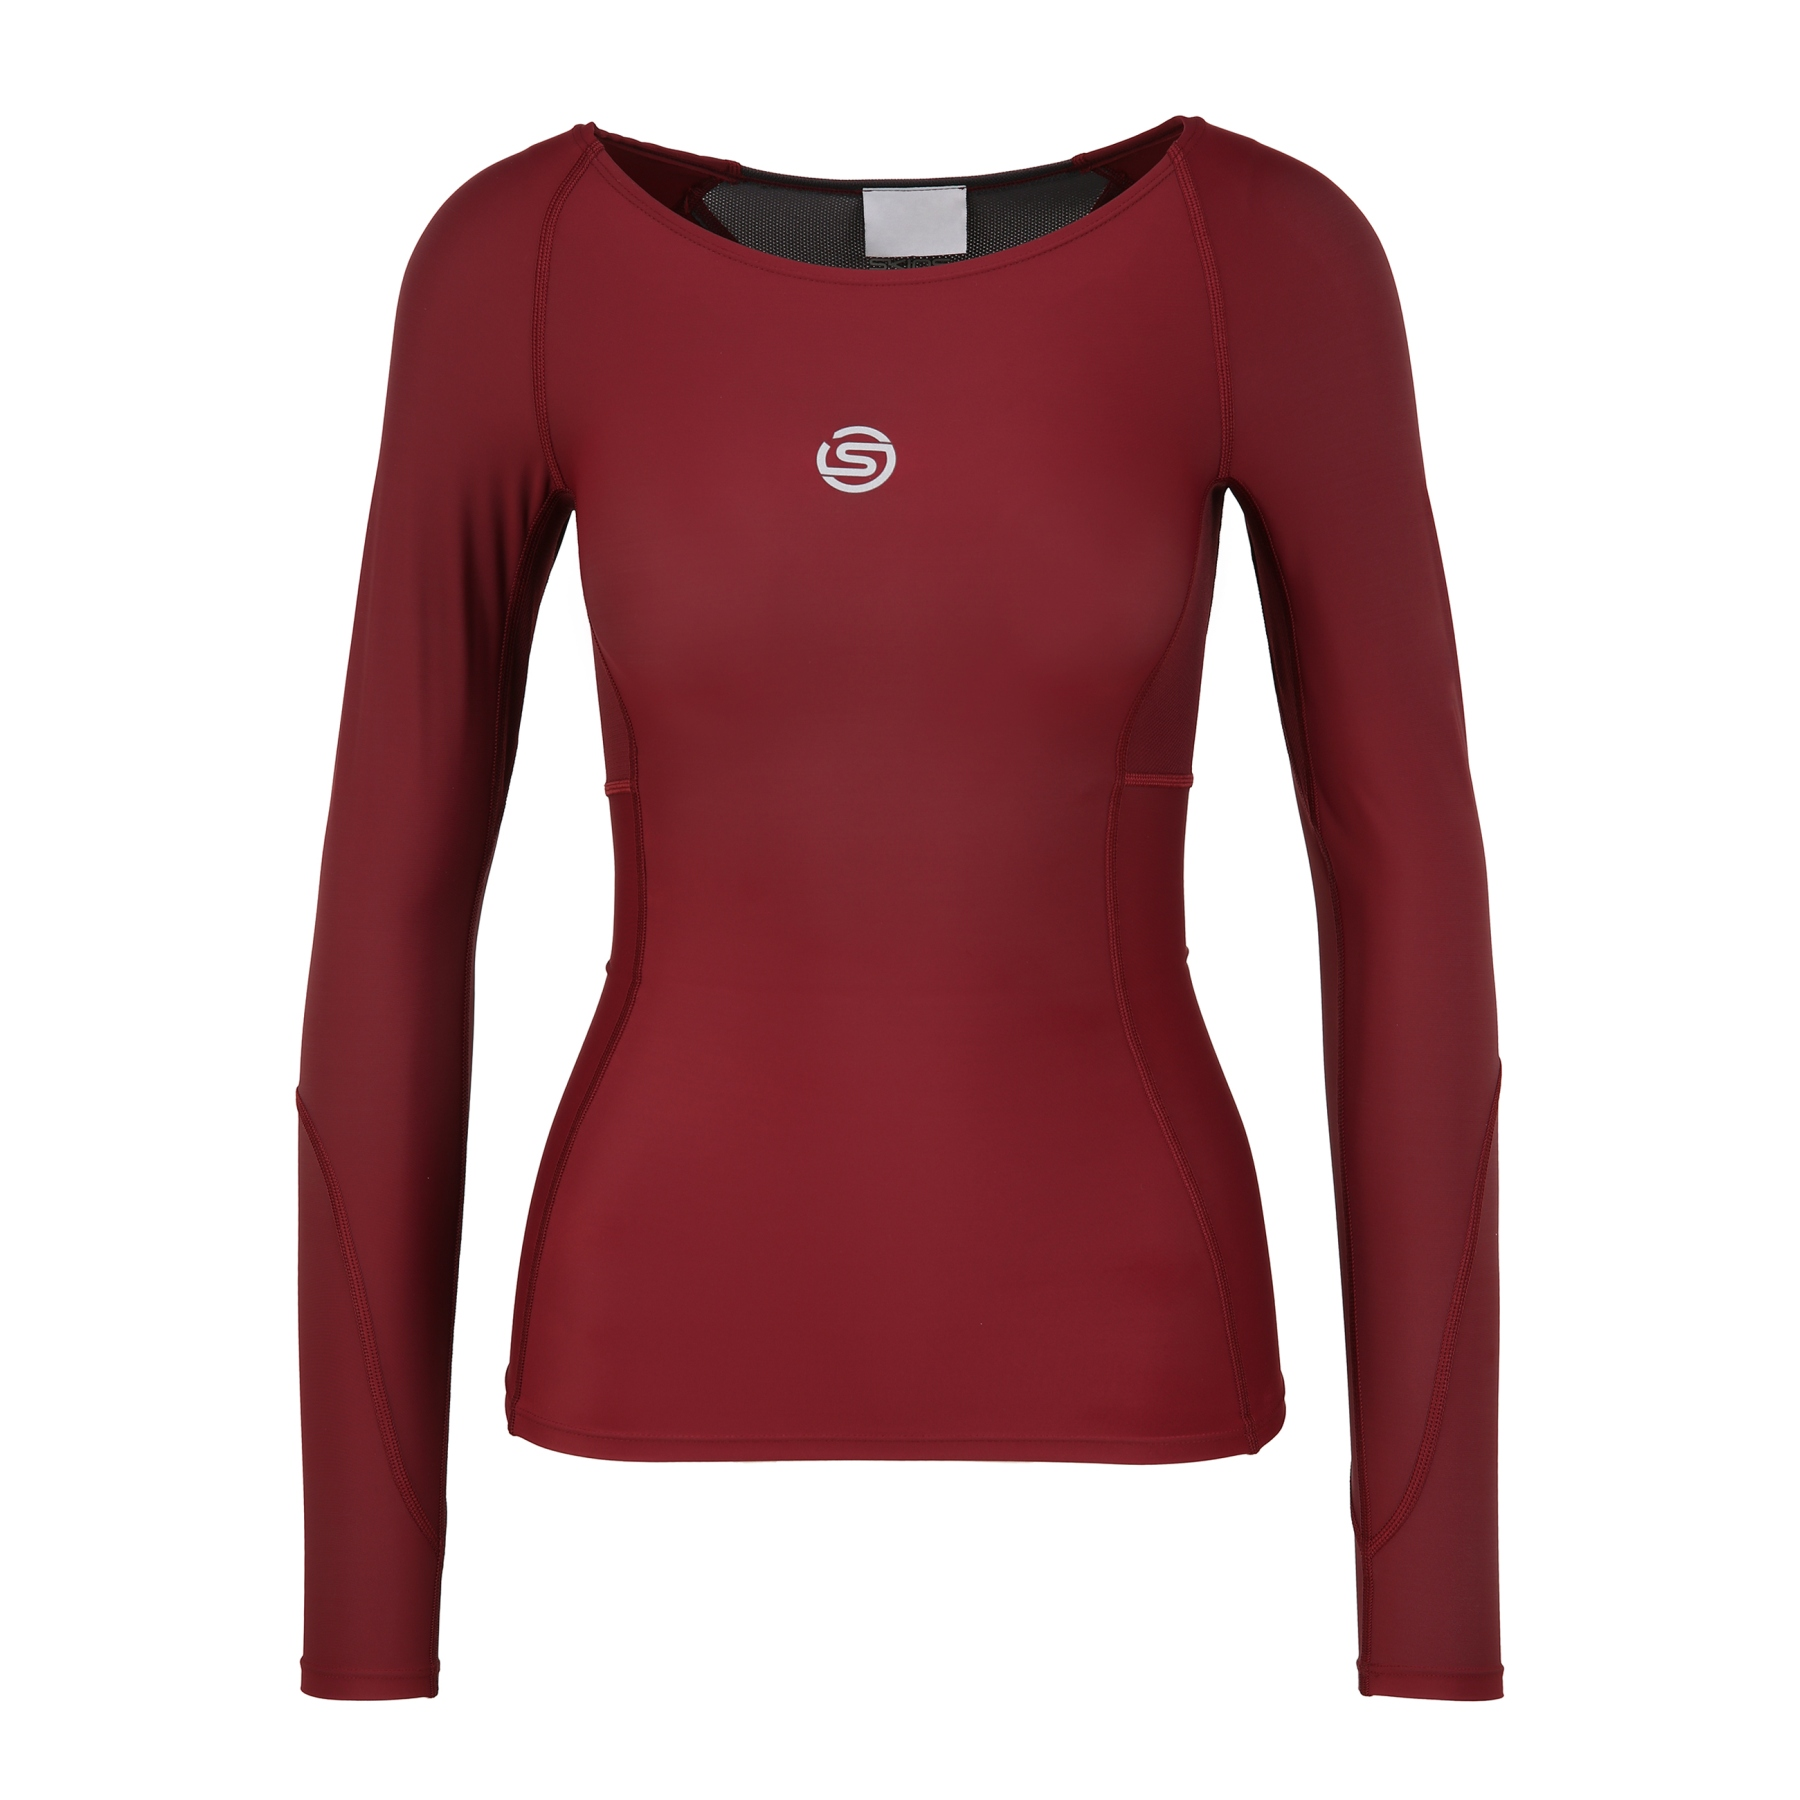 SKINS Compression 3-Series Longsleeve Shirt Women - Burgundy